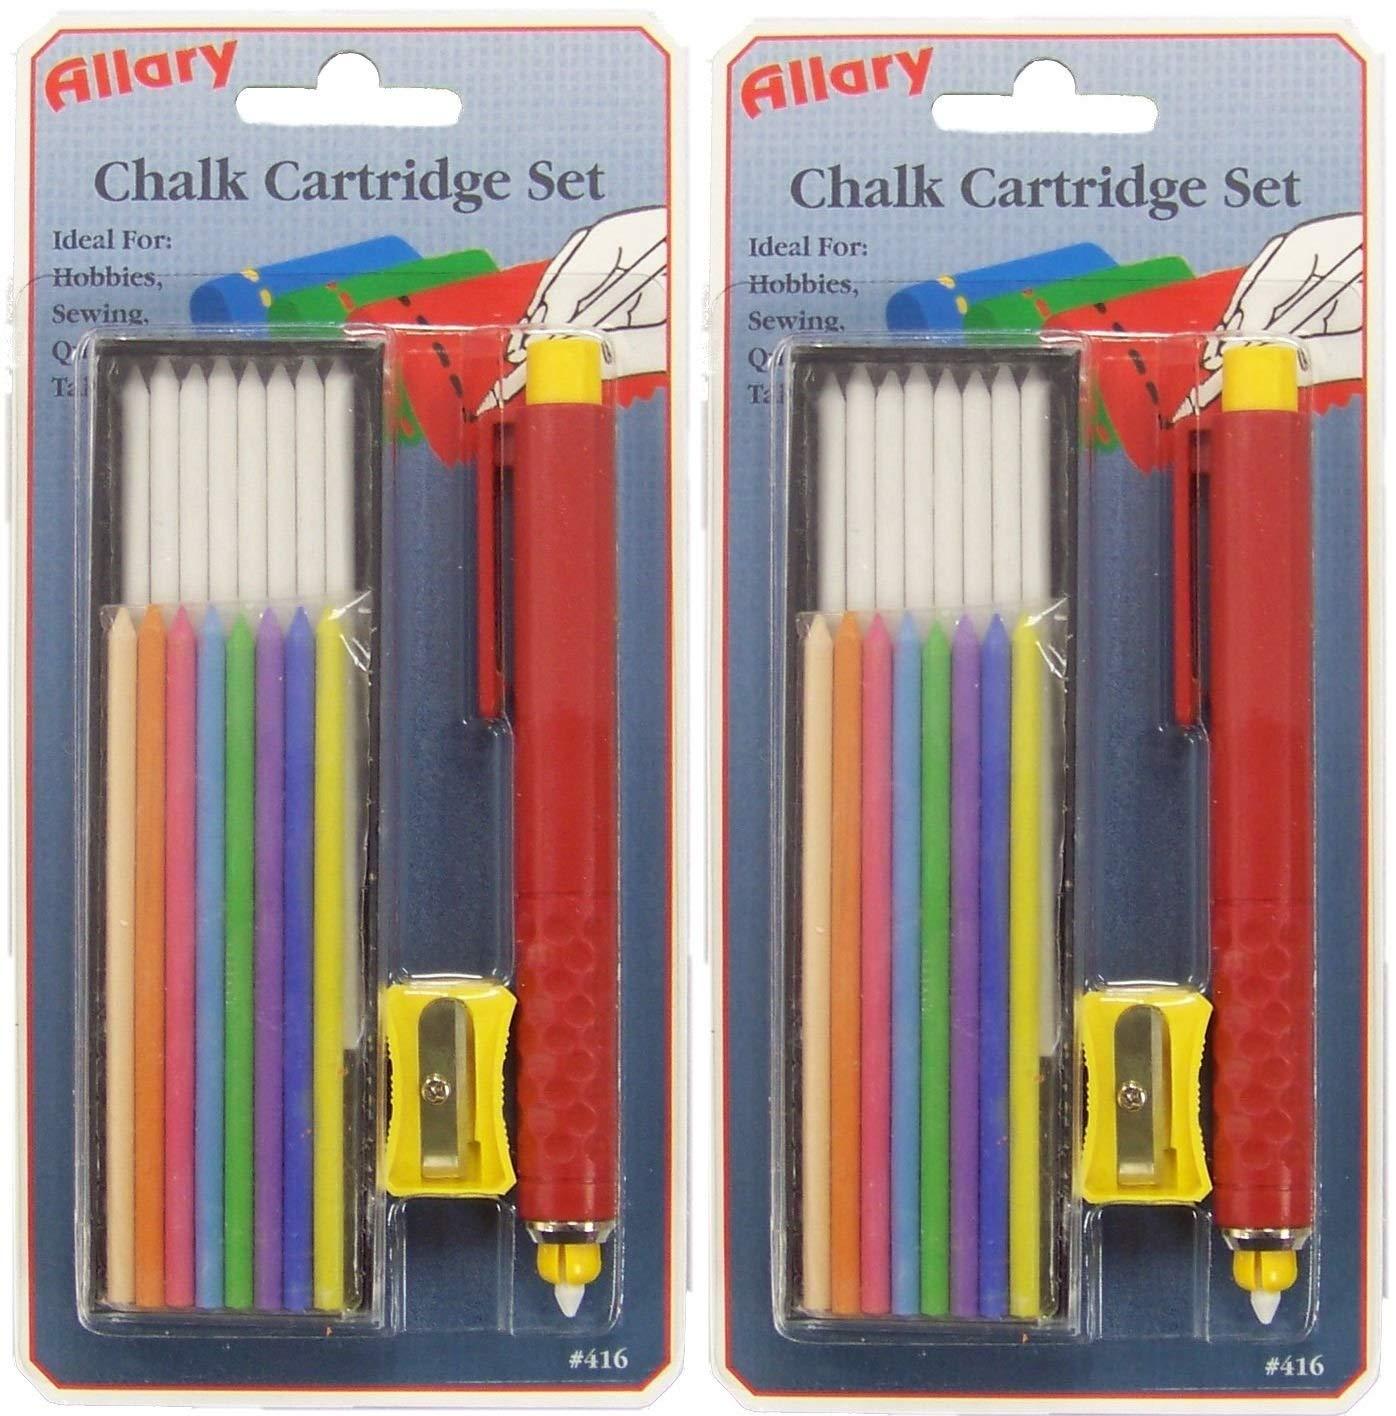 Allary Chalk Cartridge Set (Вundlе оf Тwо)